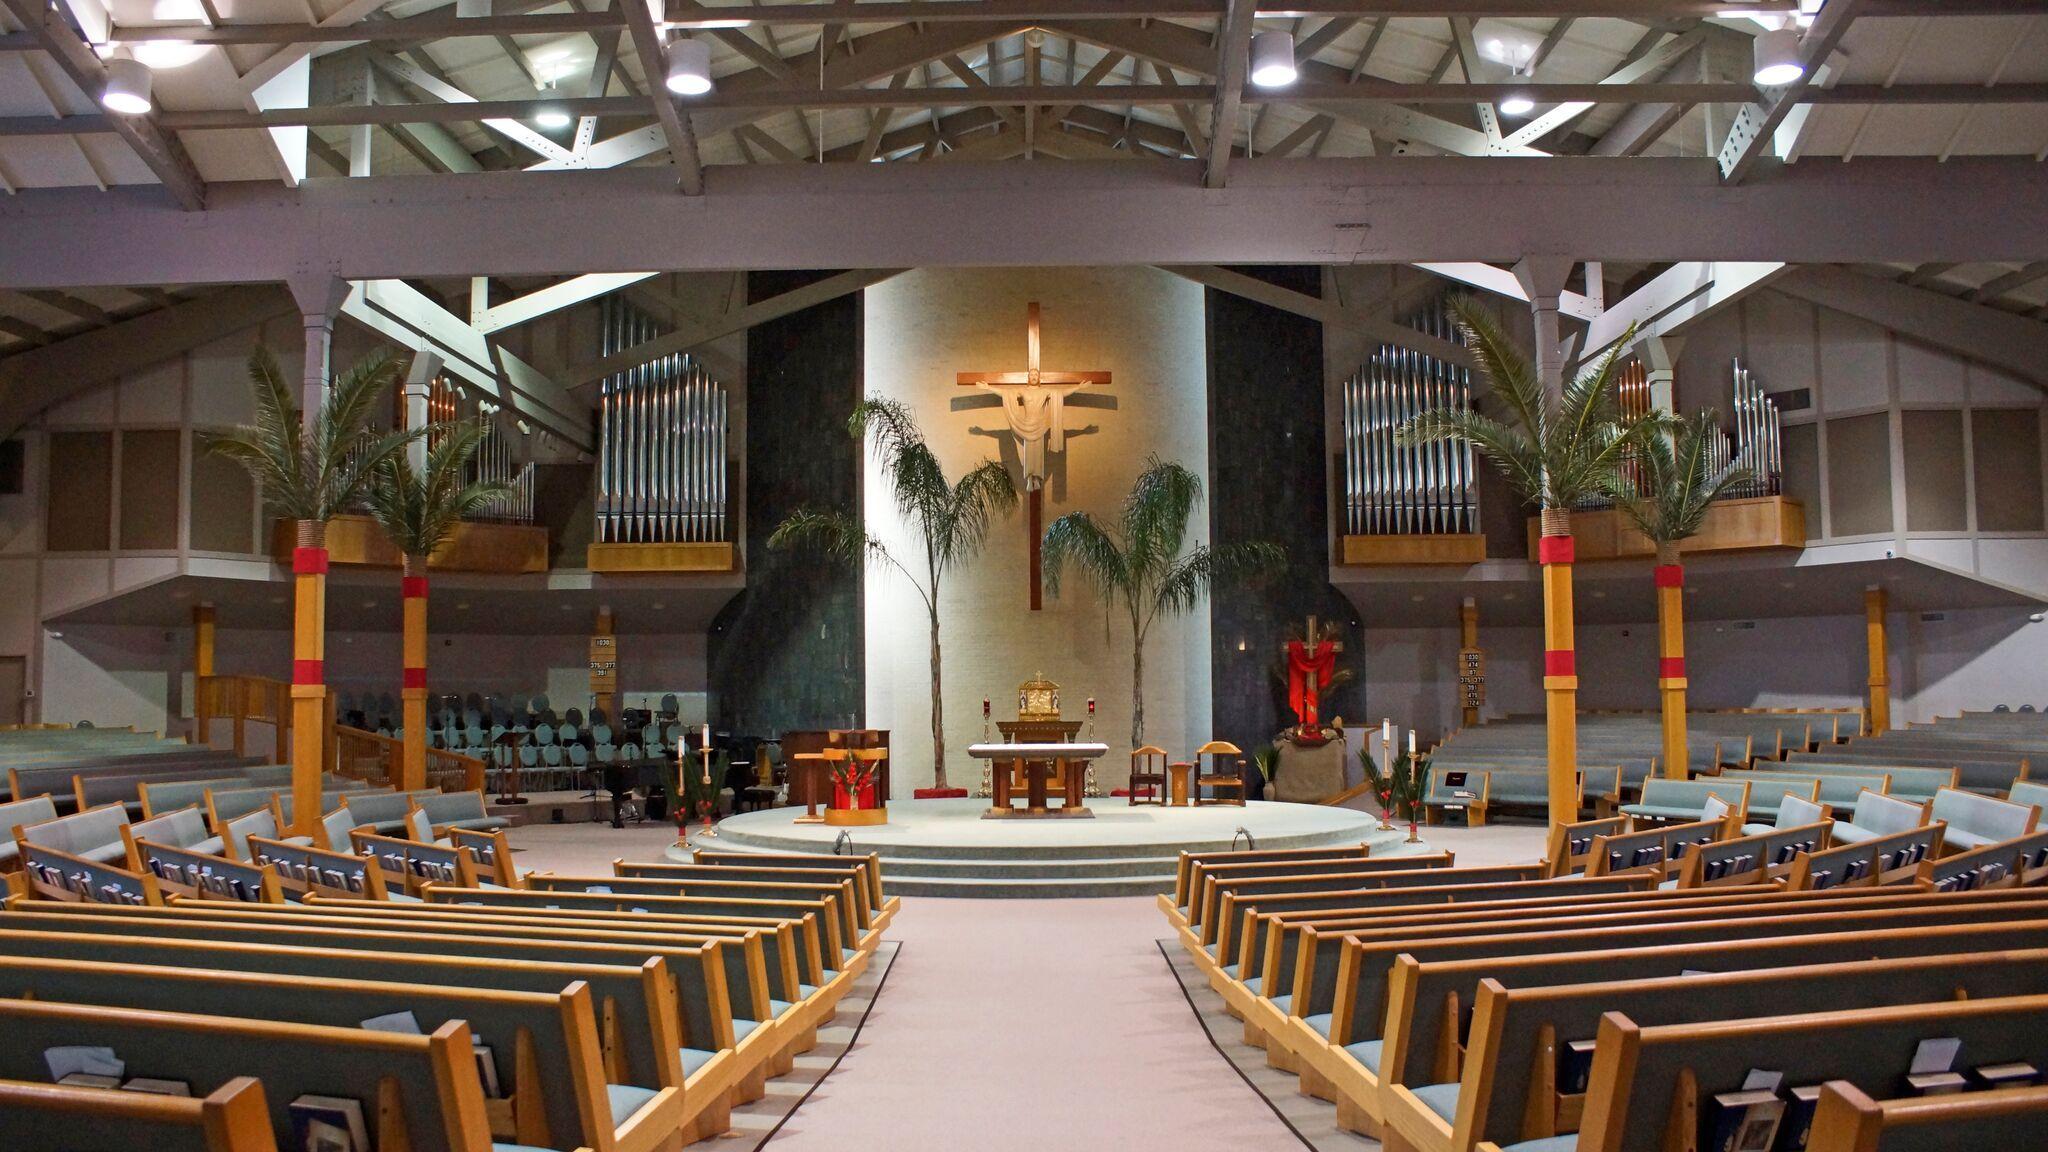 Palm Sunday Epiphany of The Lord Catholic Church. Katy, Tx. | Church ...